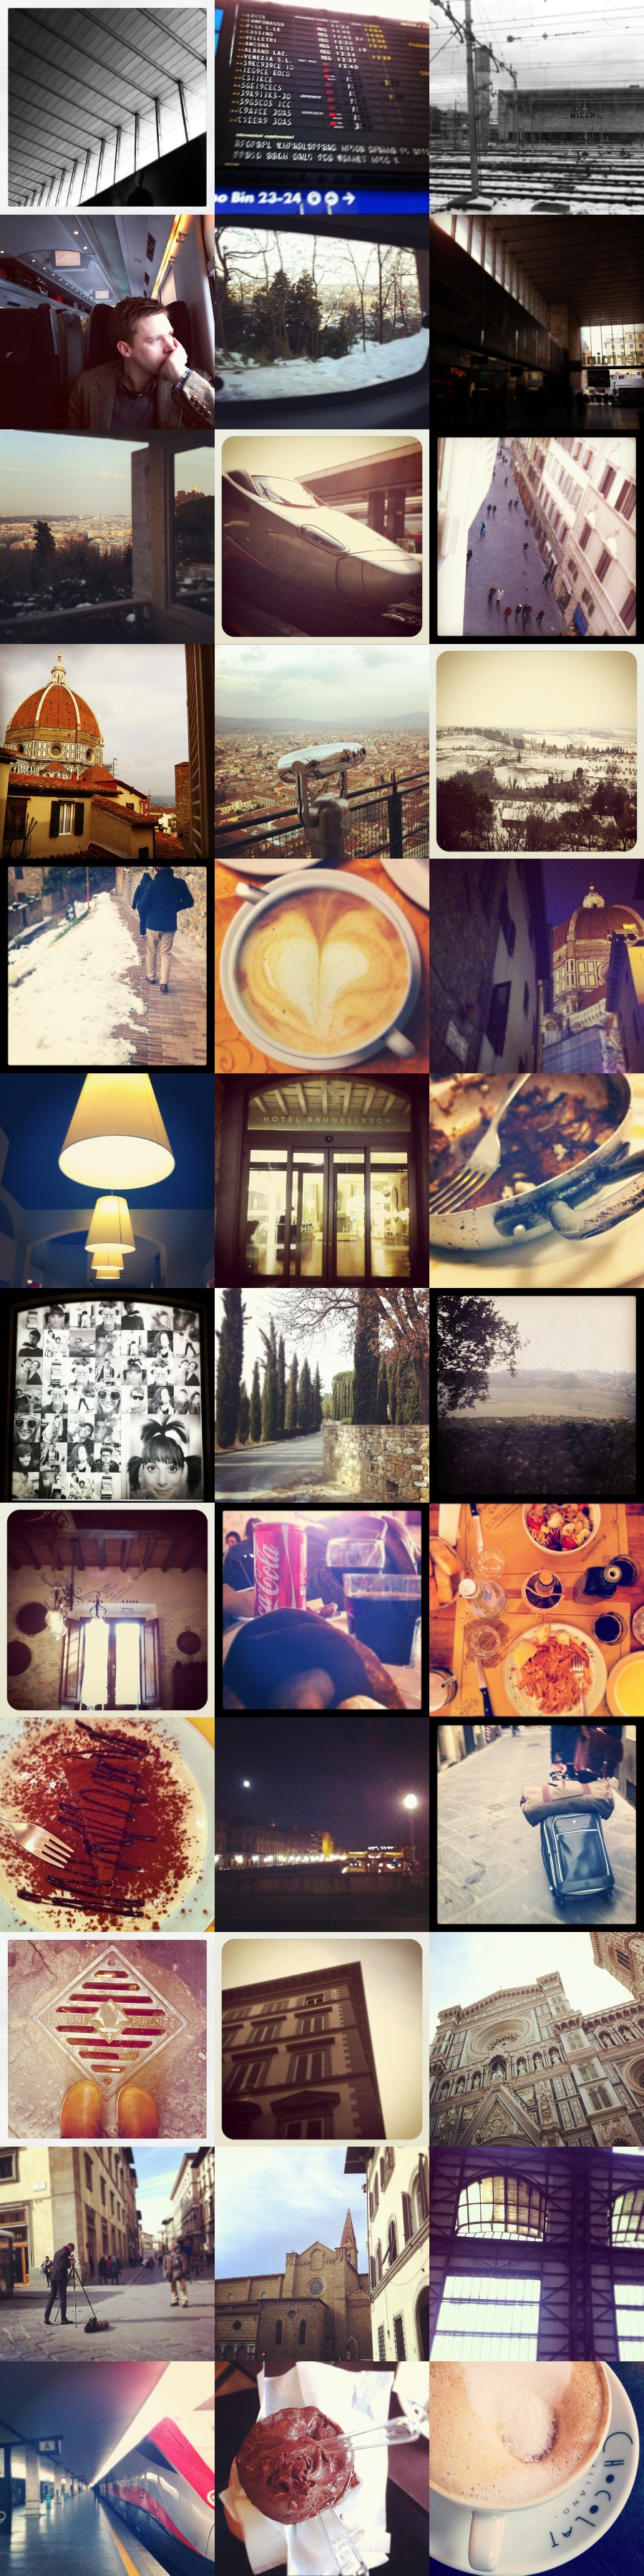 instagram_mosaic2